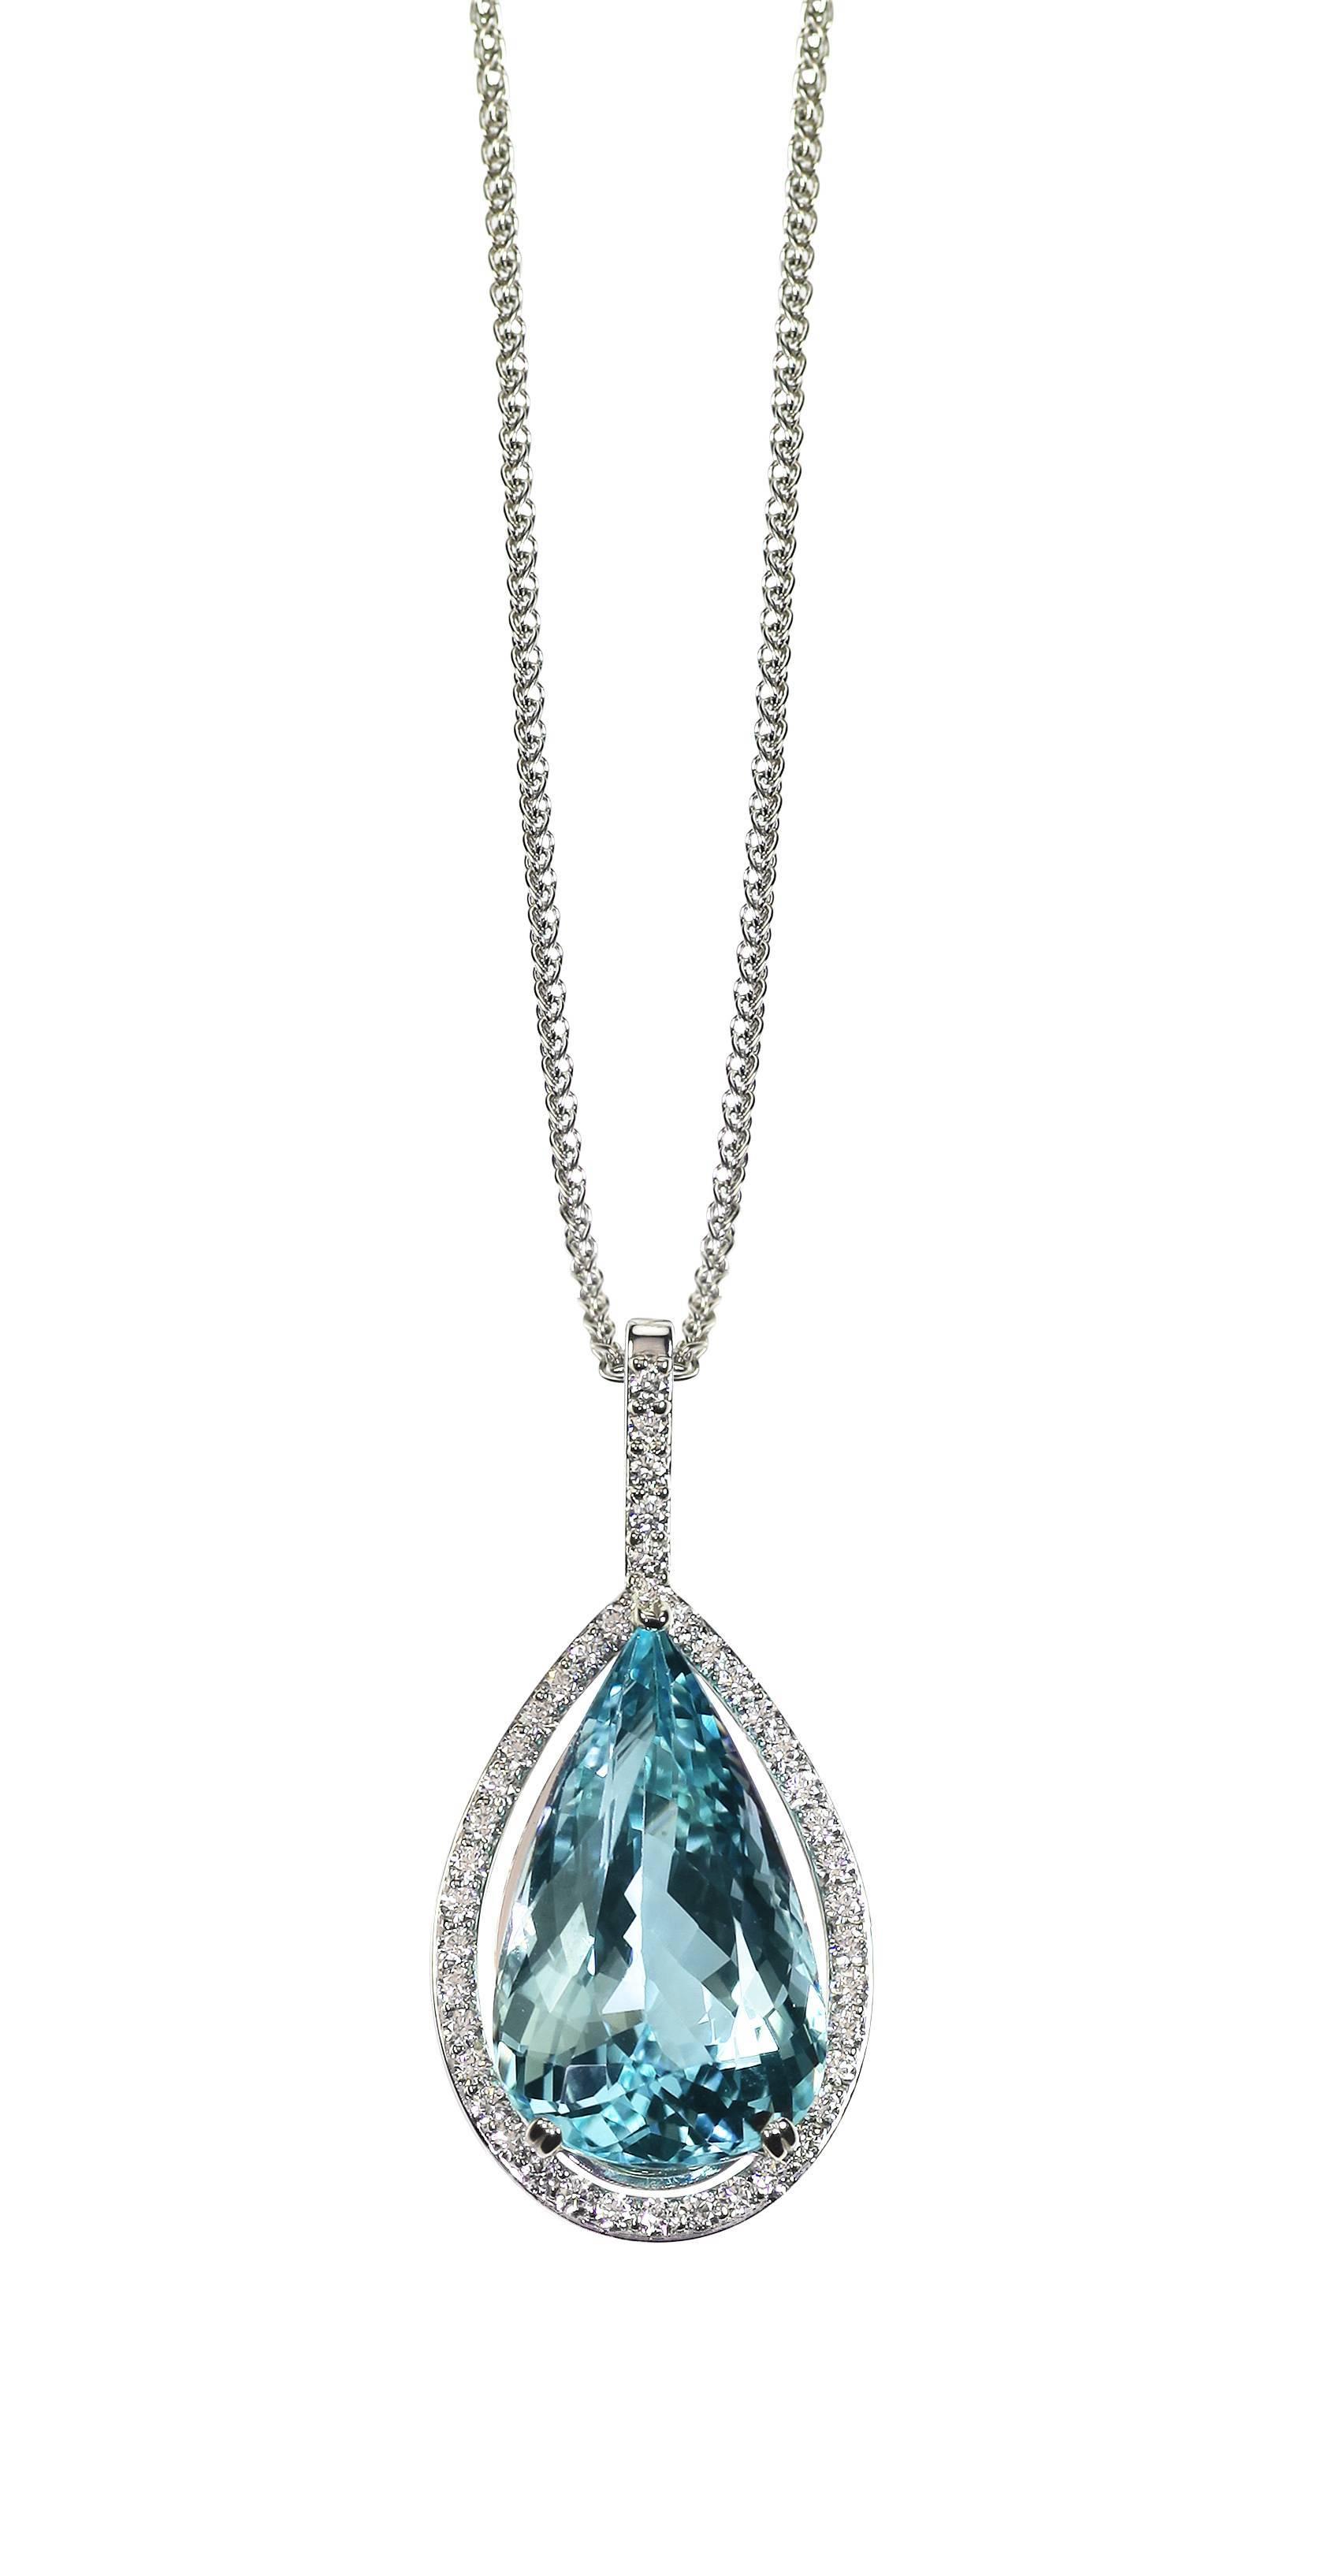 swarovski cristal - Cristal Swarovski : créez un bijou unique